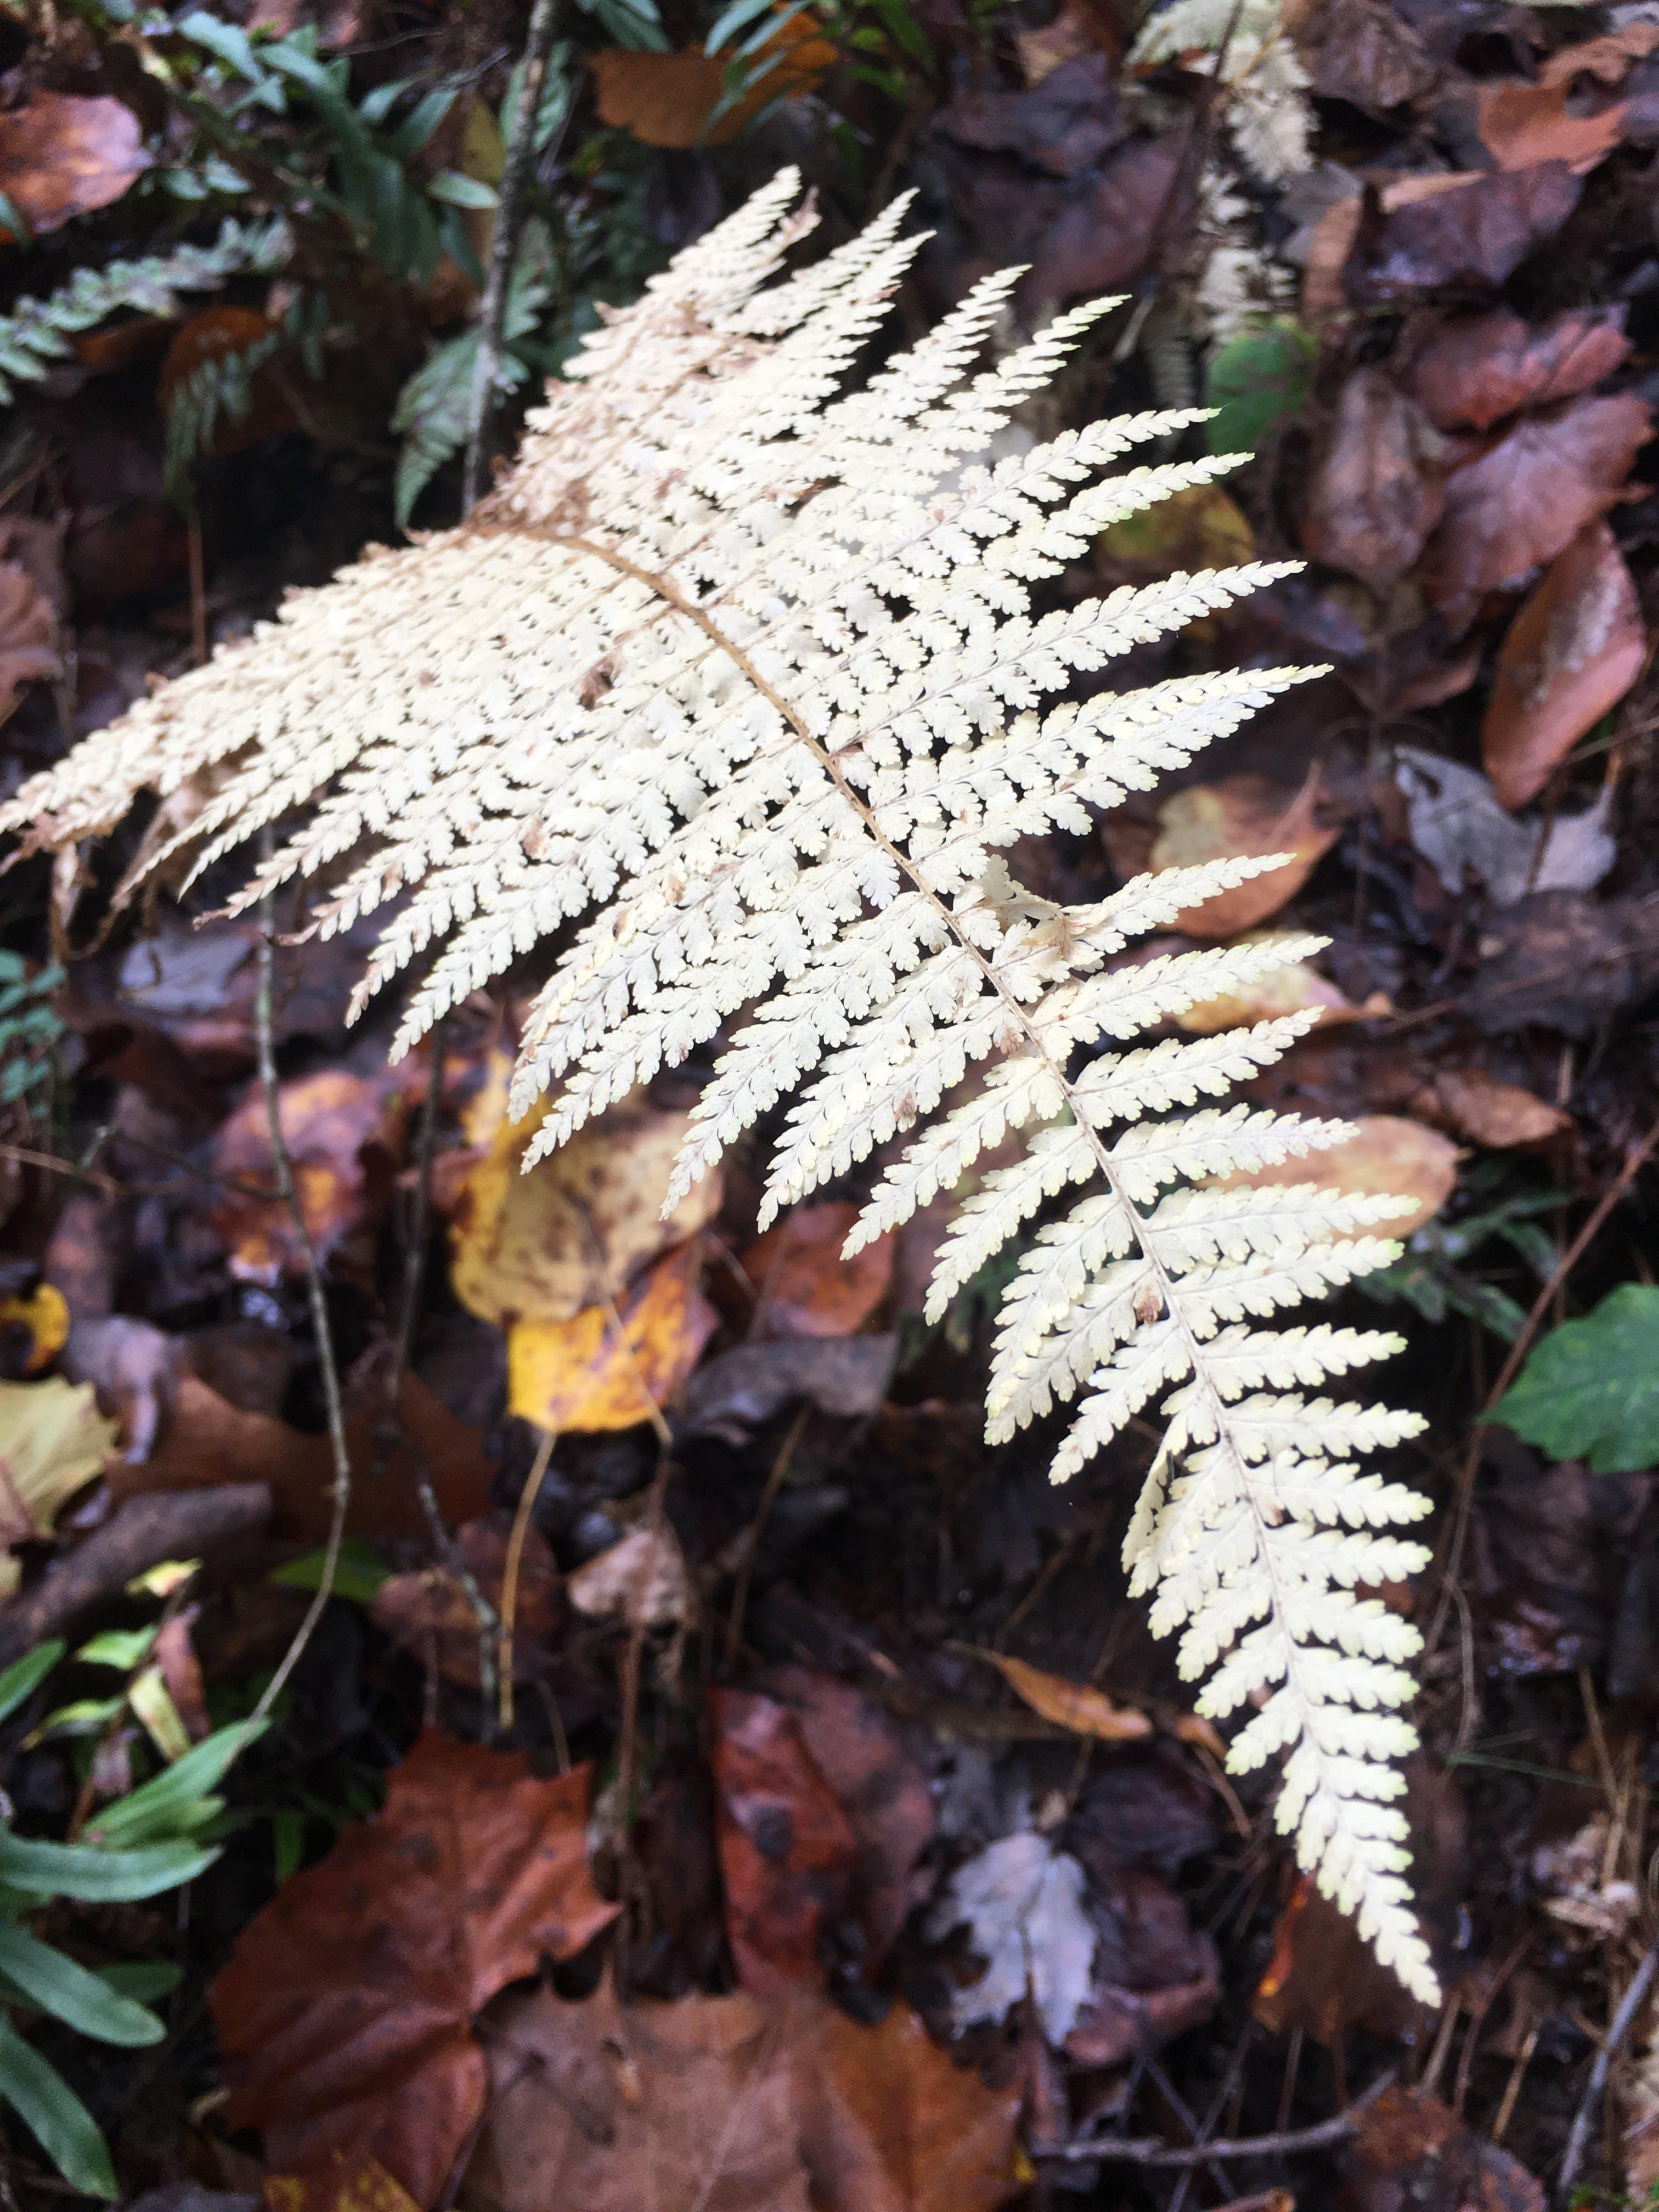 Free stock photo of moody, fallen leaves, white fern